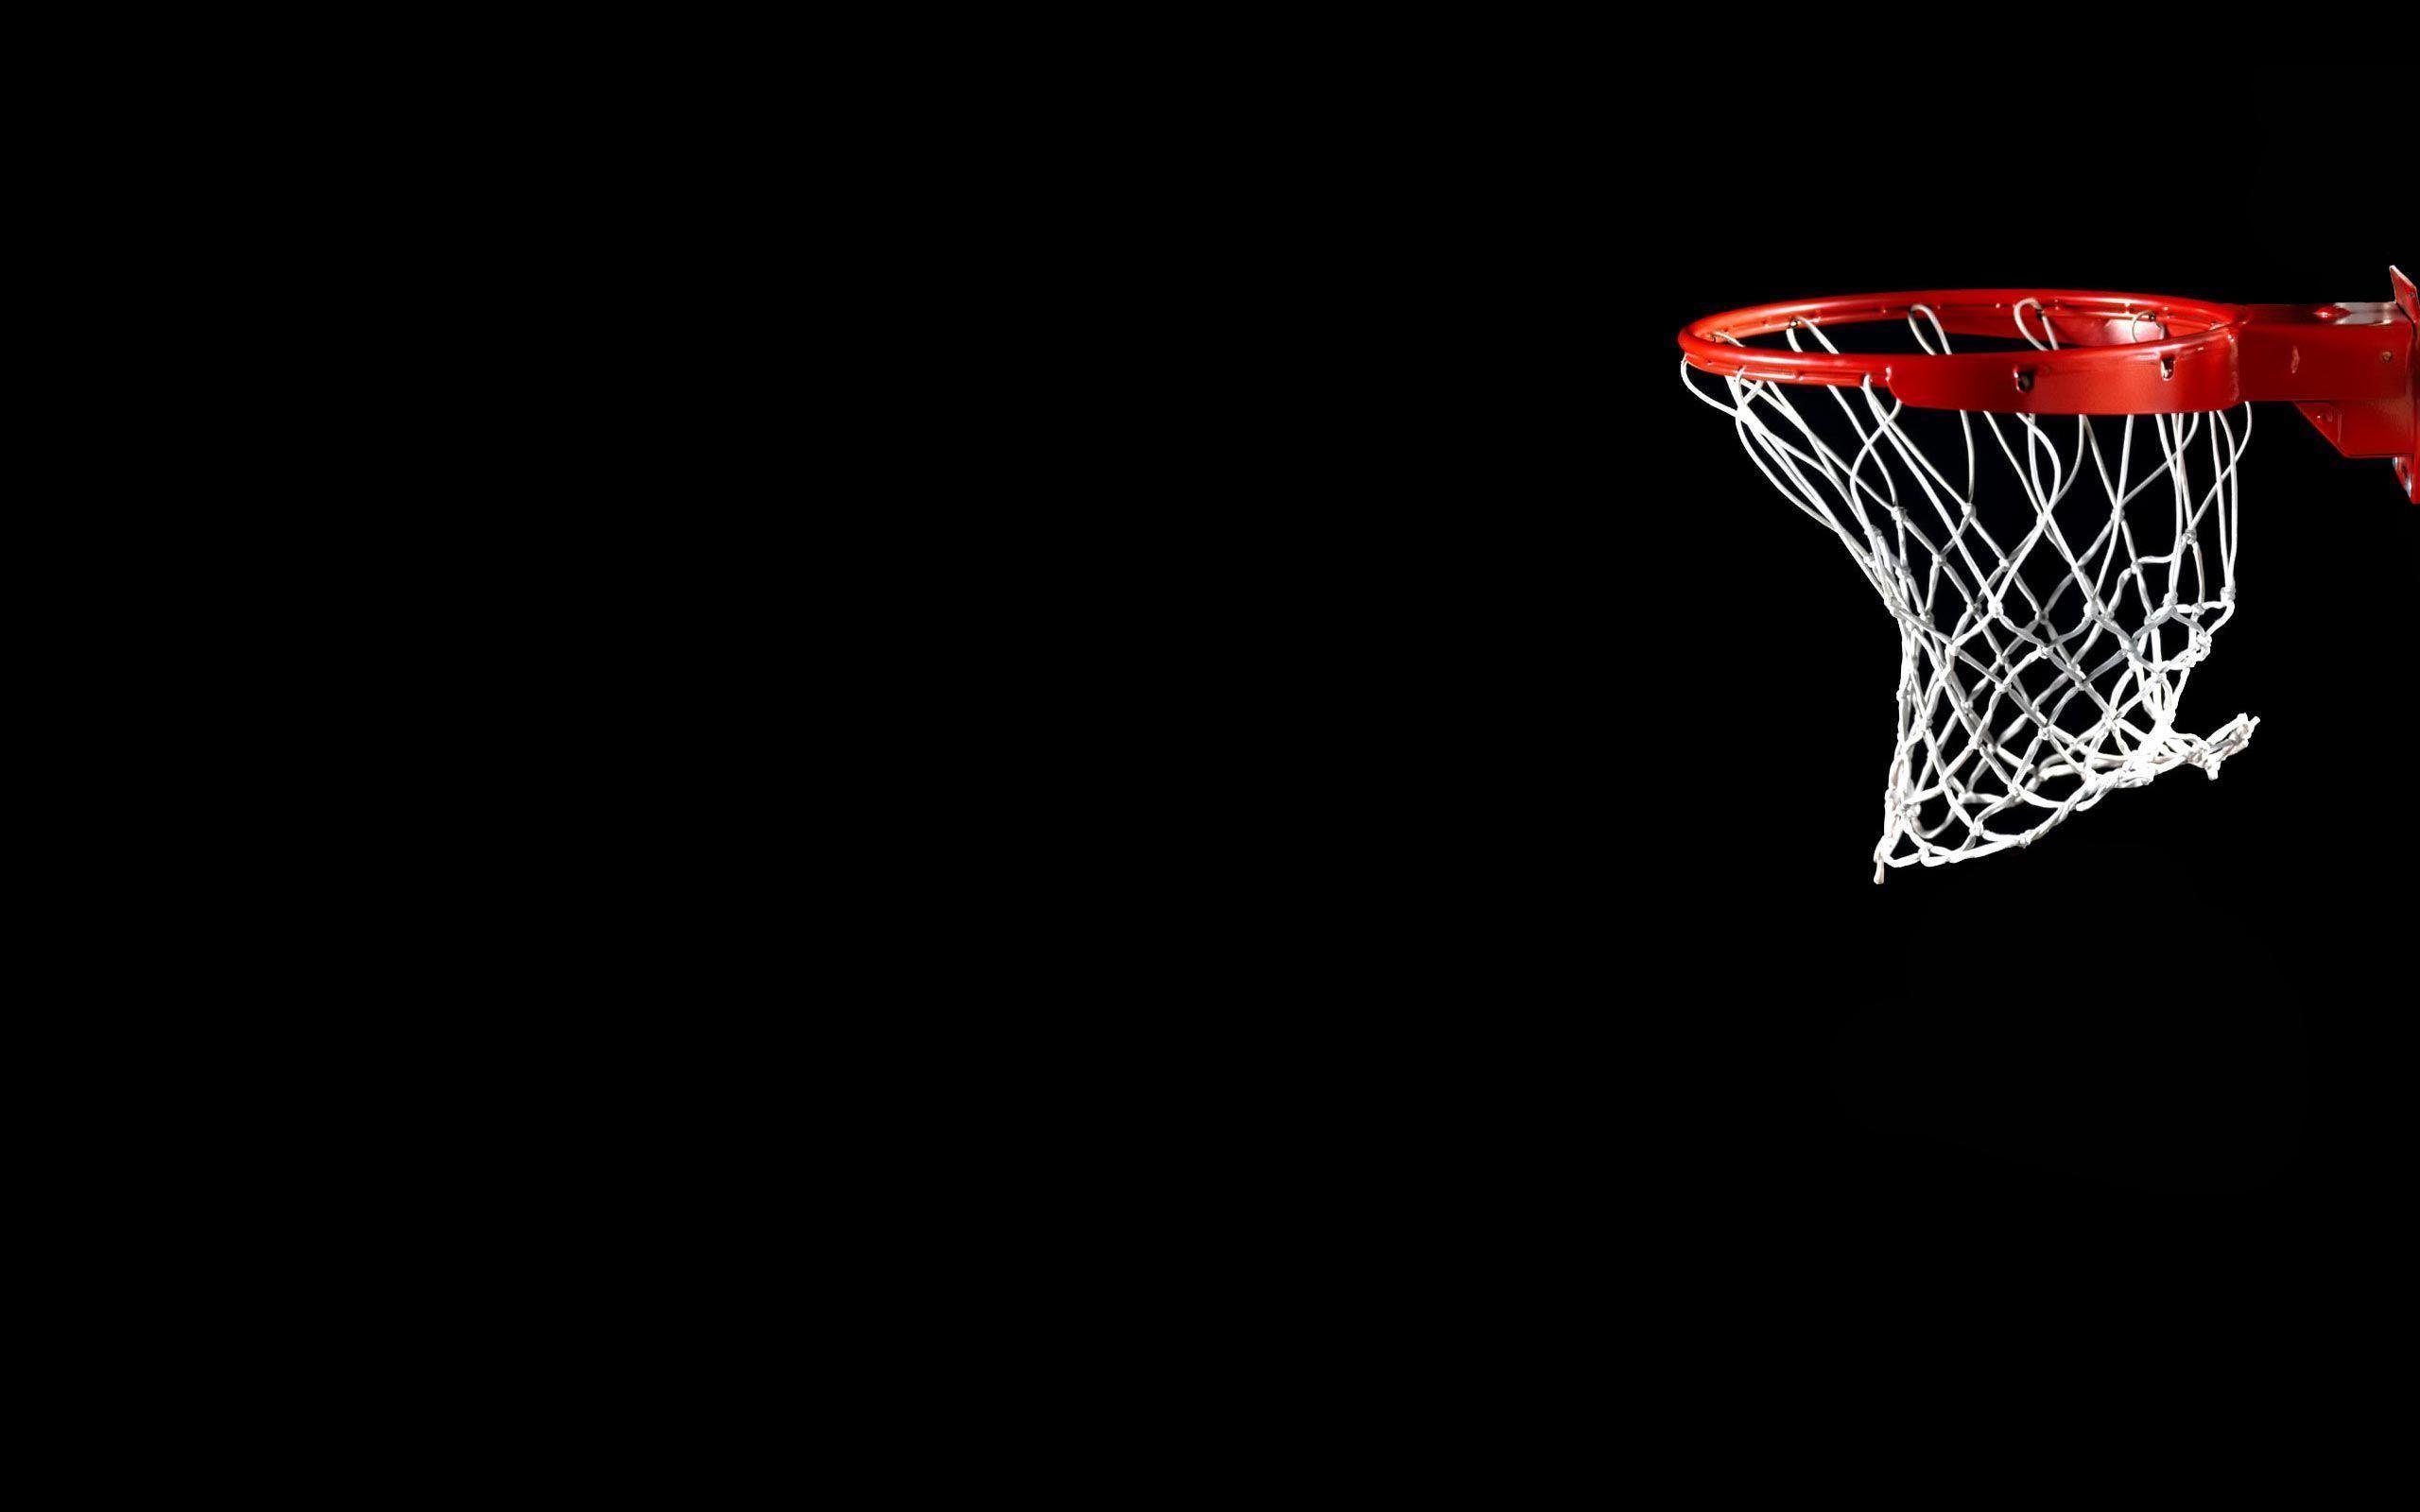 free Basketball Wallpapers